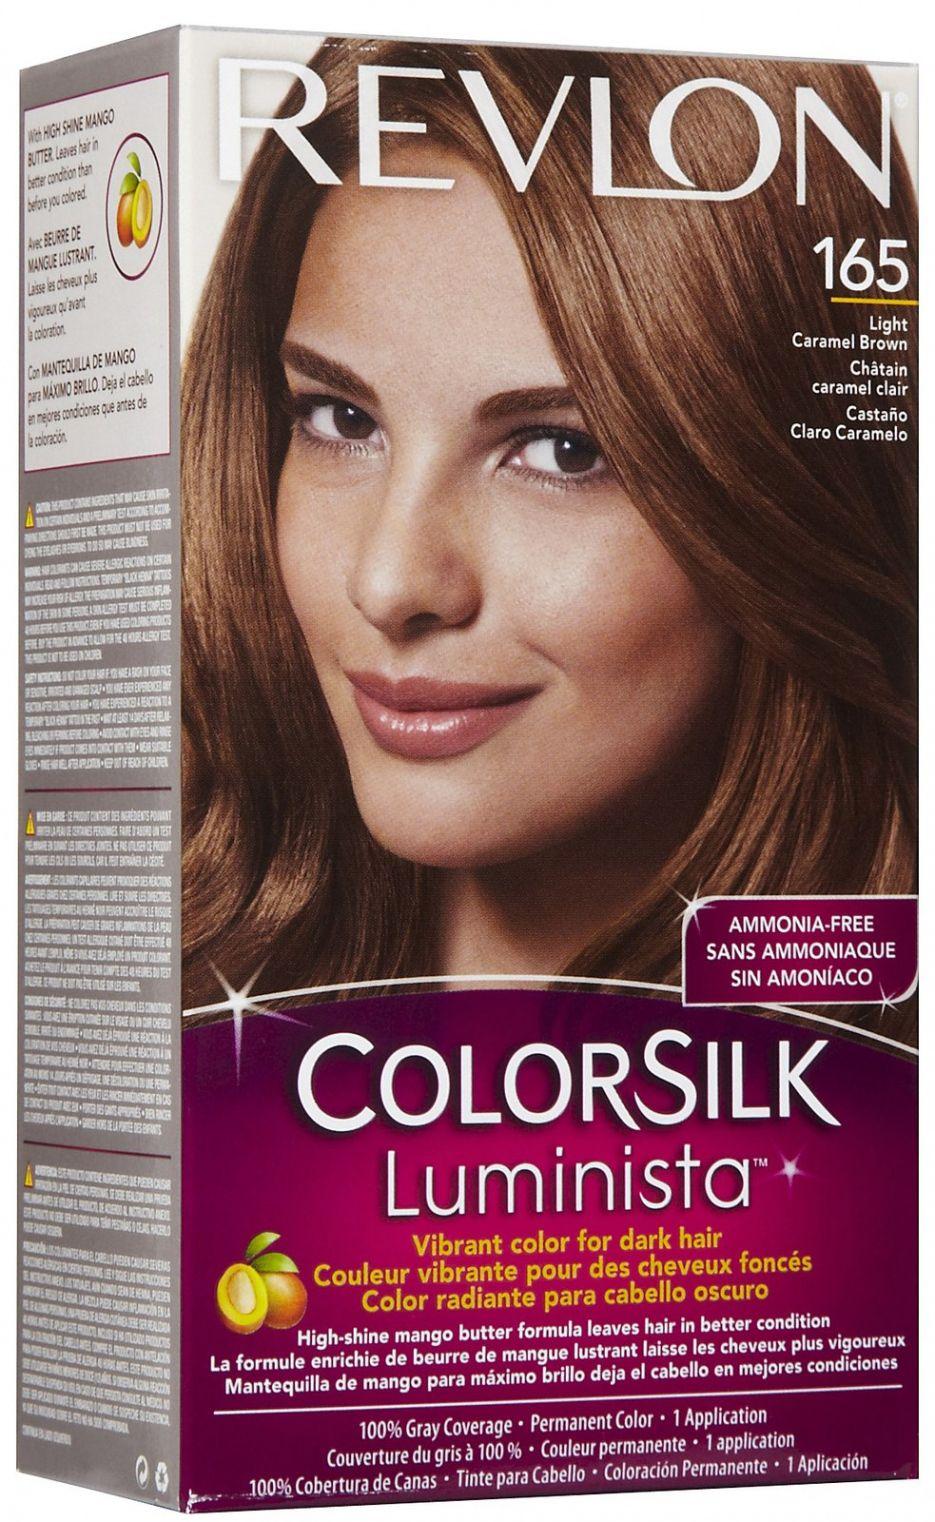 Light Caramel Brown Hair Color Revlon Best At Home Semi Permanent Hair Color Check More Permanent Hair Color Caramel Brown Hair Color Hair Inspiration Color